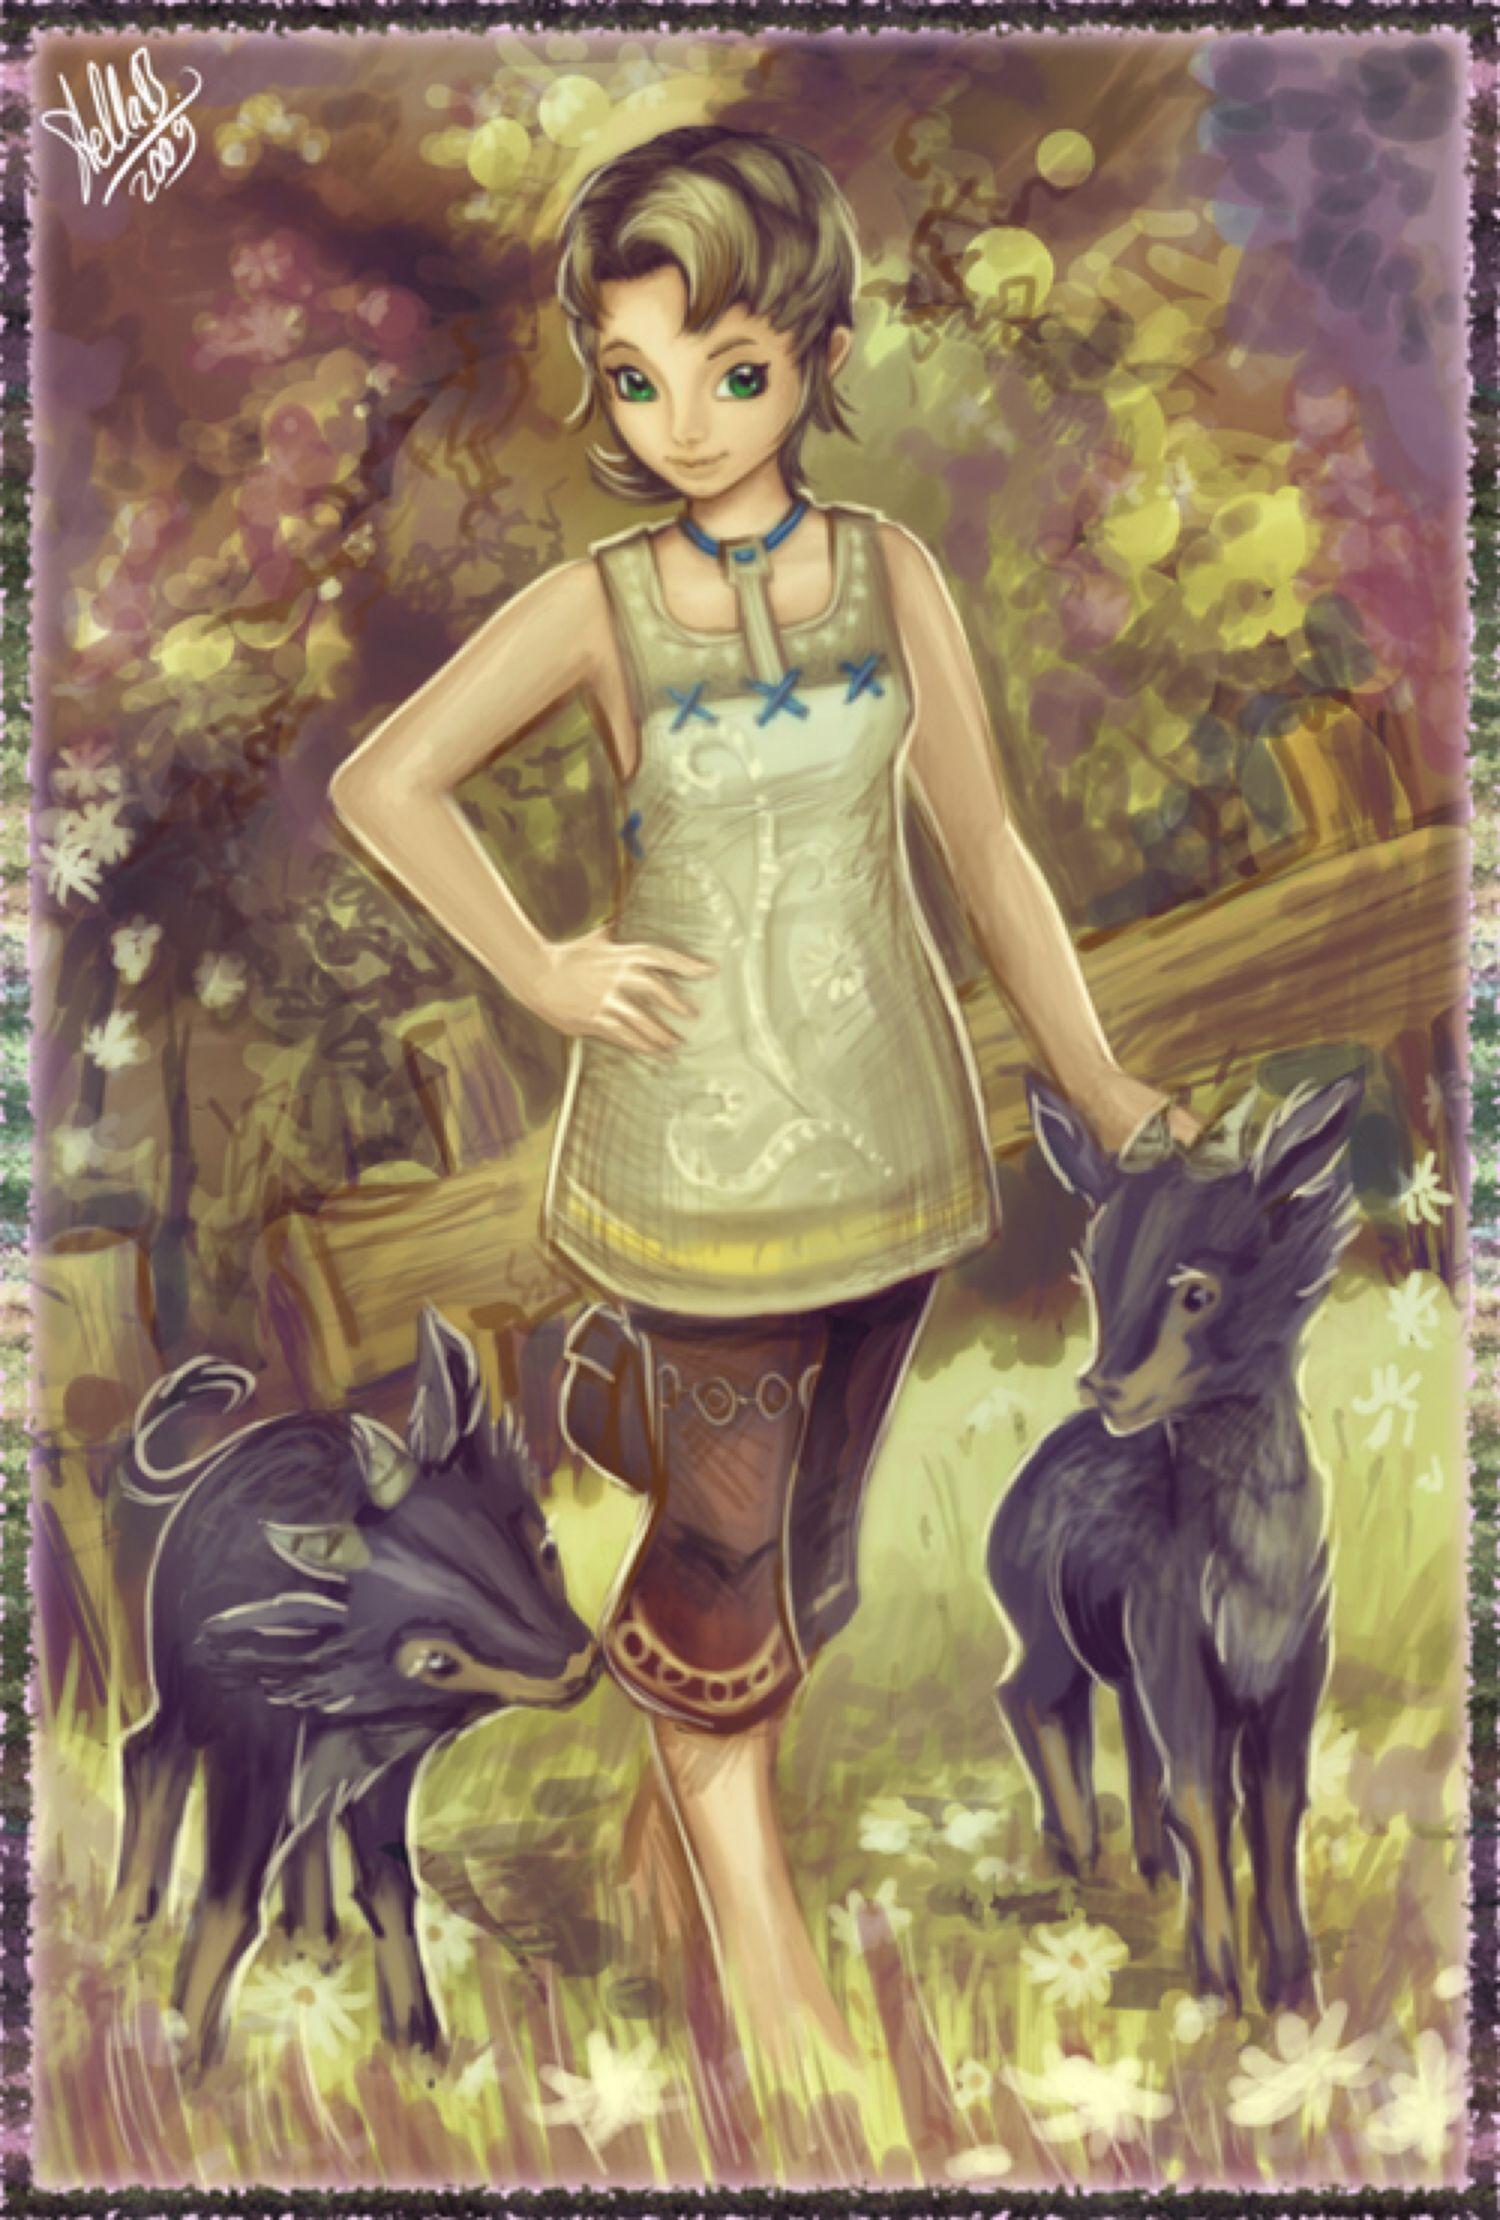 Ilia from Legend of Zelda: Twilight Princess by Sushi